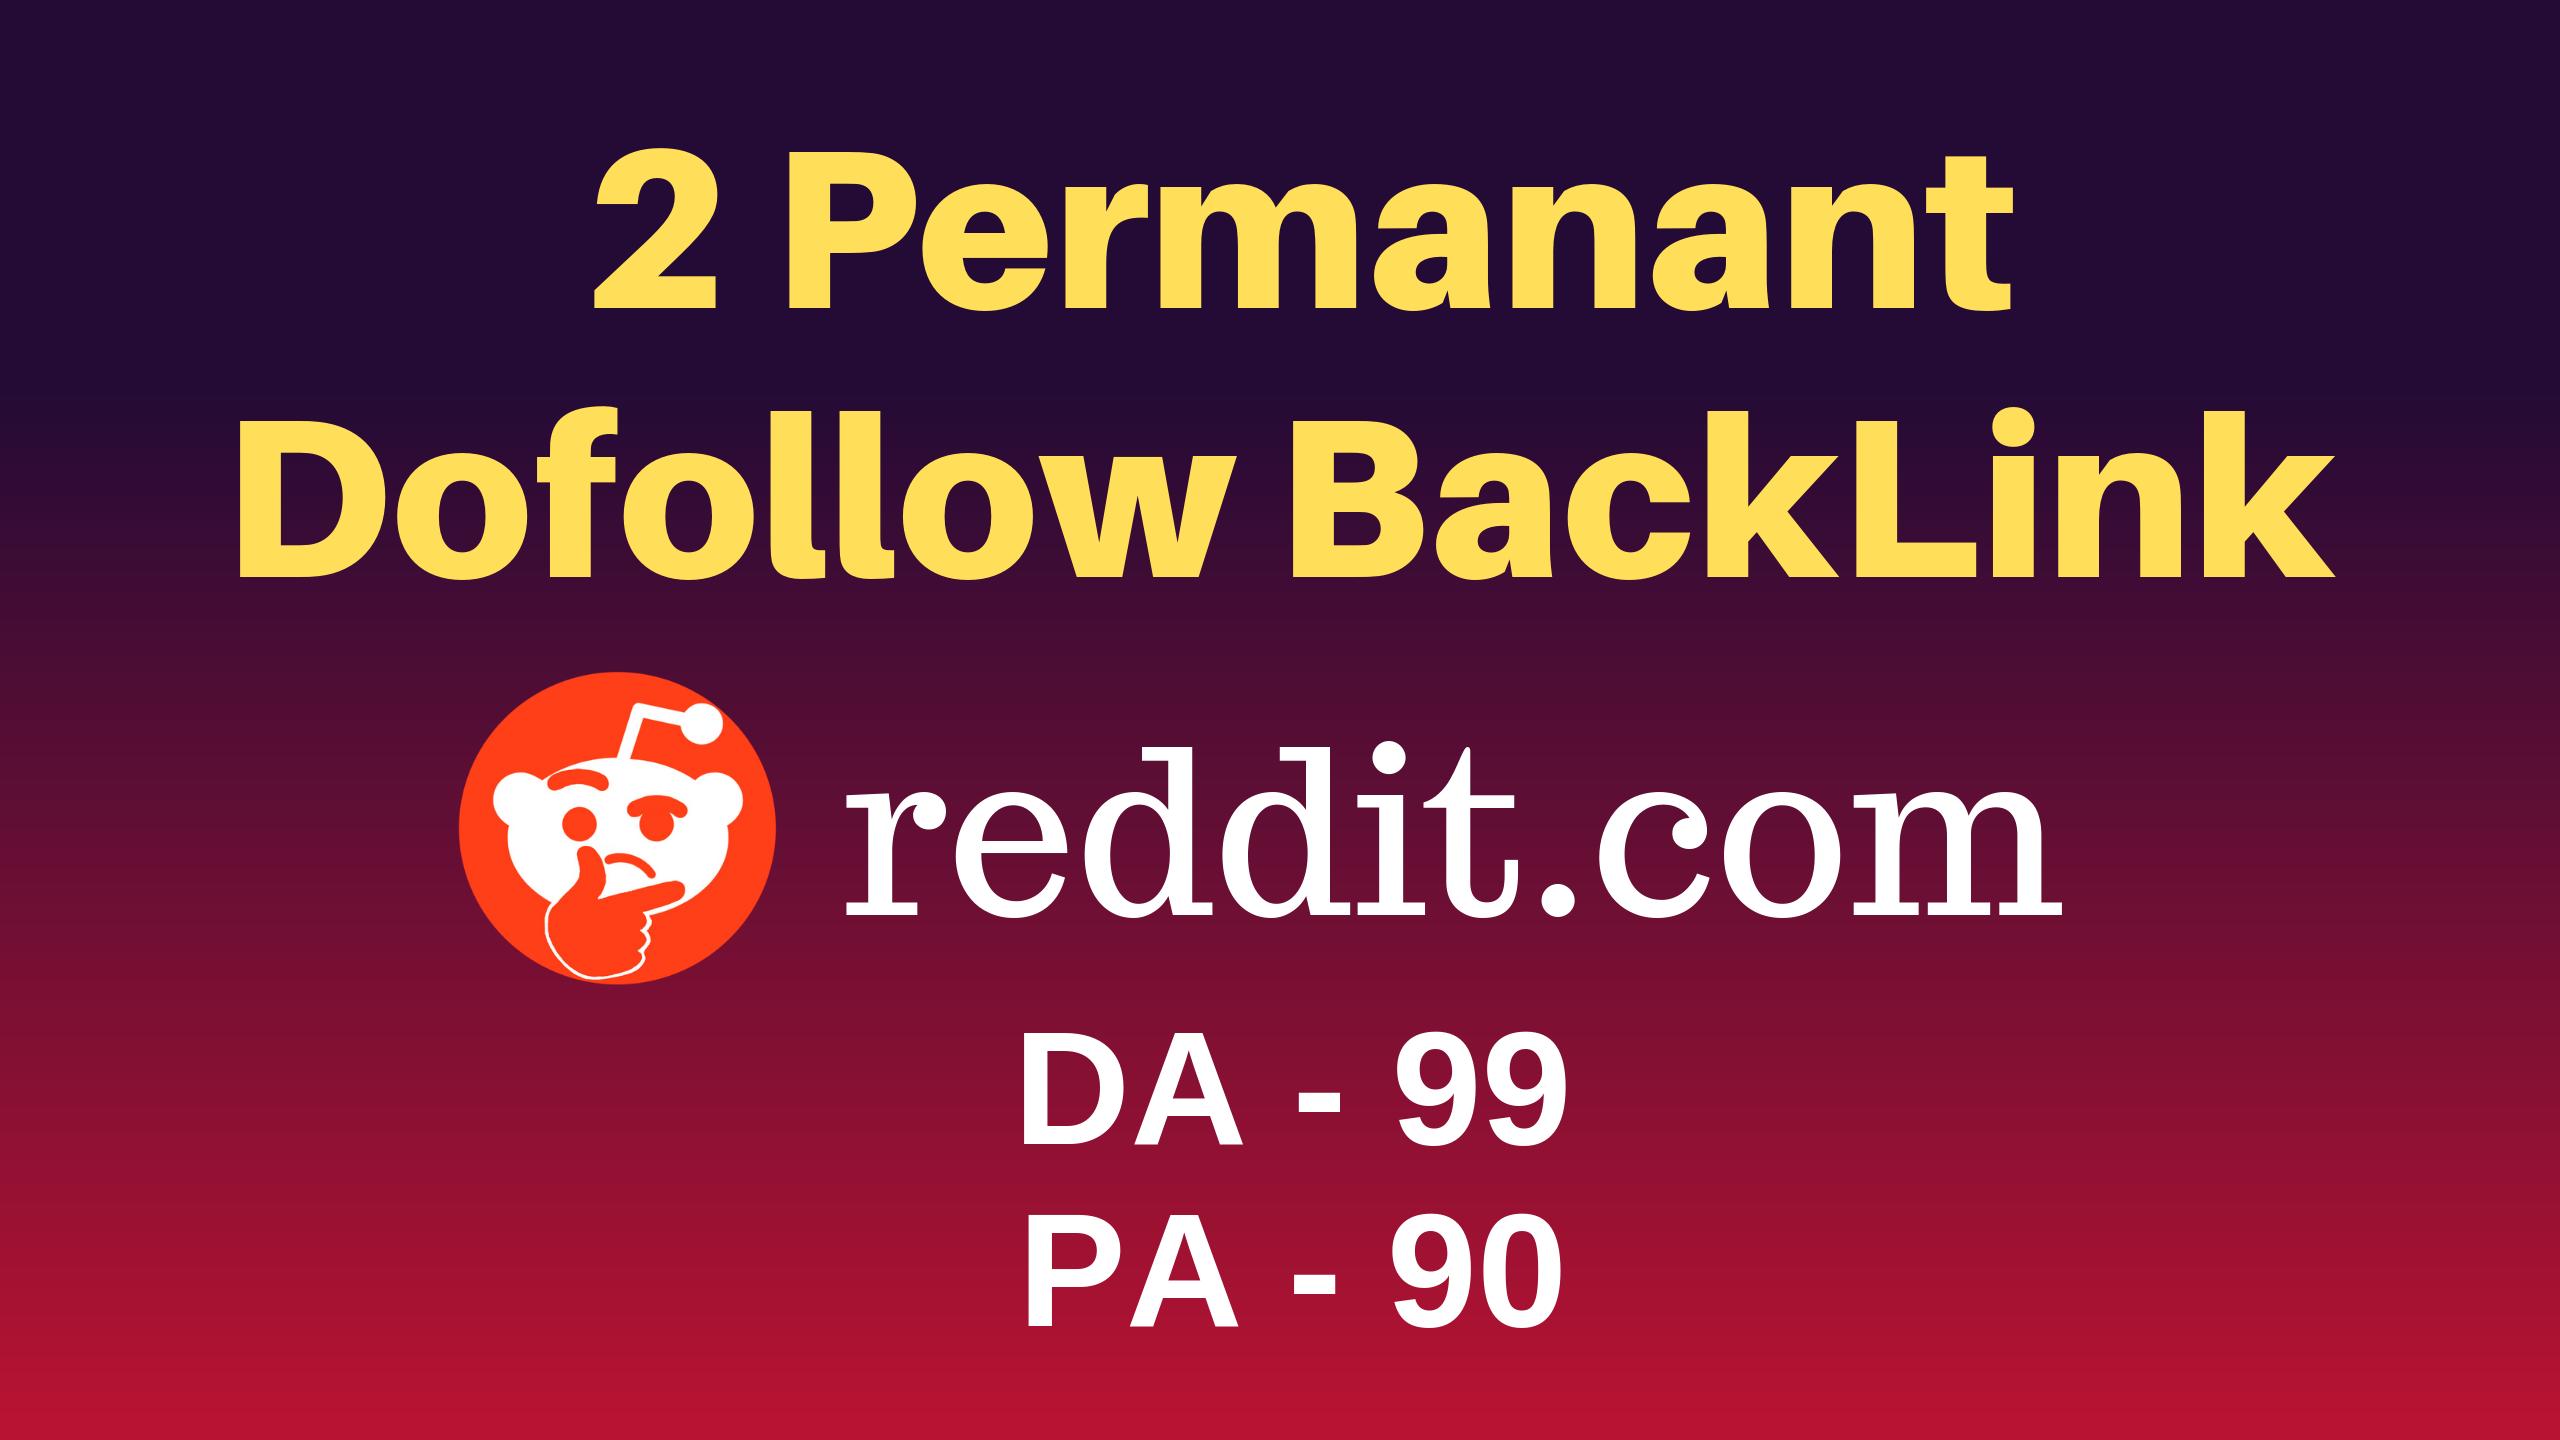 2 Permanant High Quality Reddit Dofollow DA 99 & PA 90 Backlink